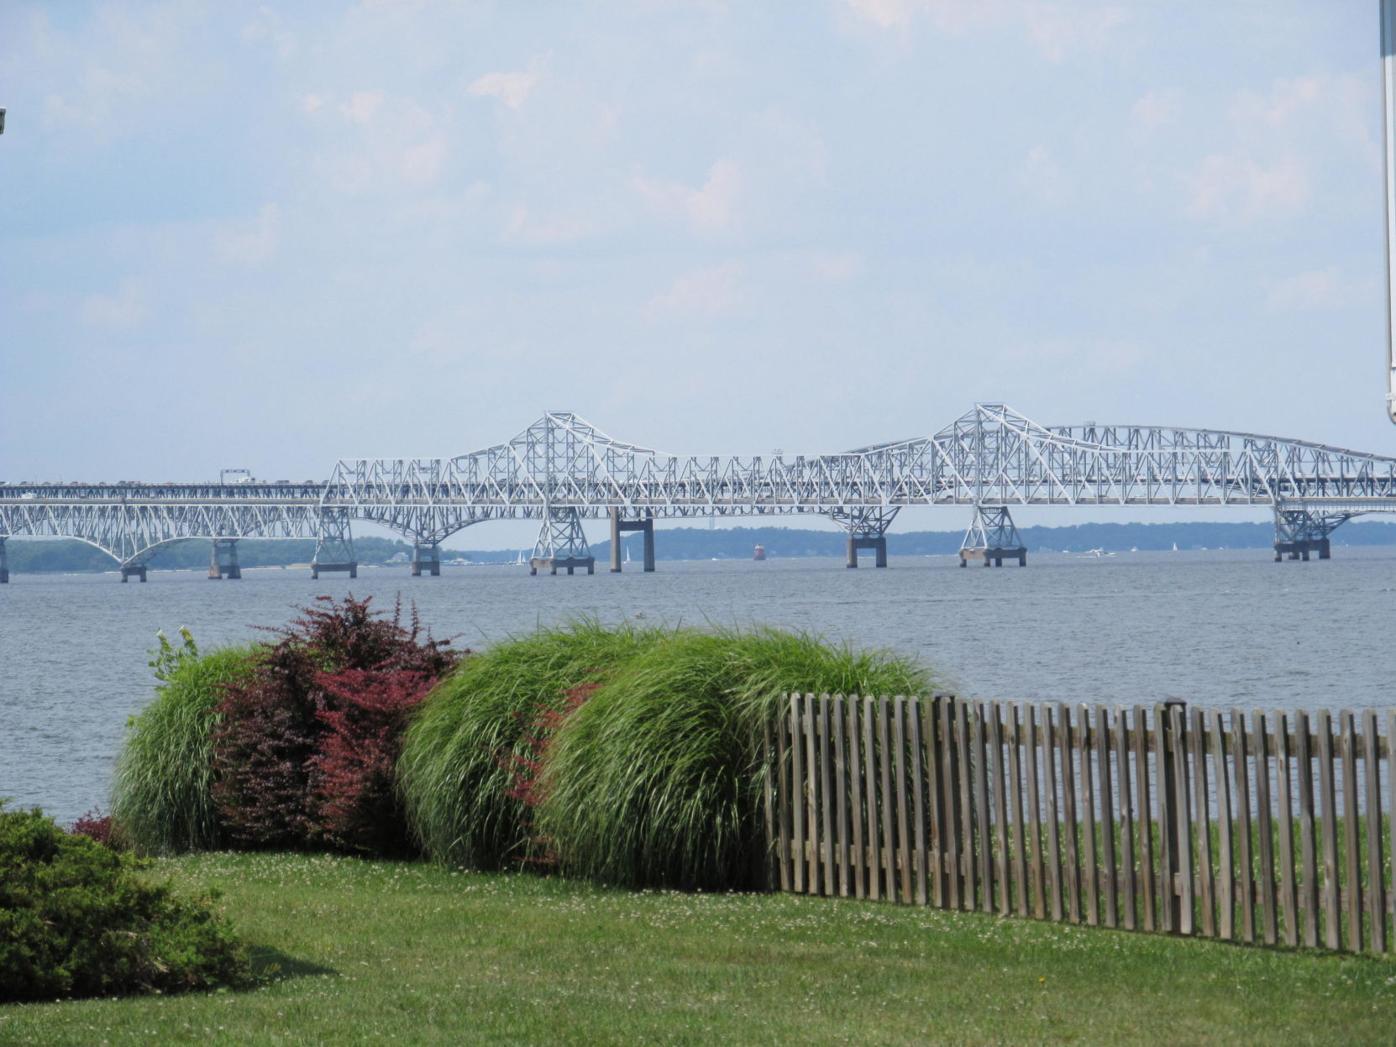 Chesapeake Bay / Bay Bridge